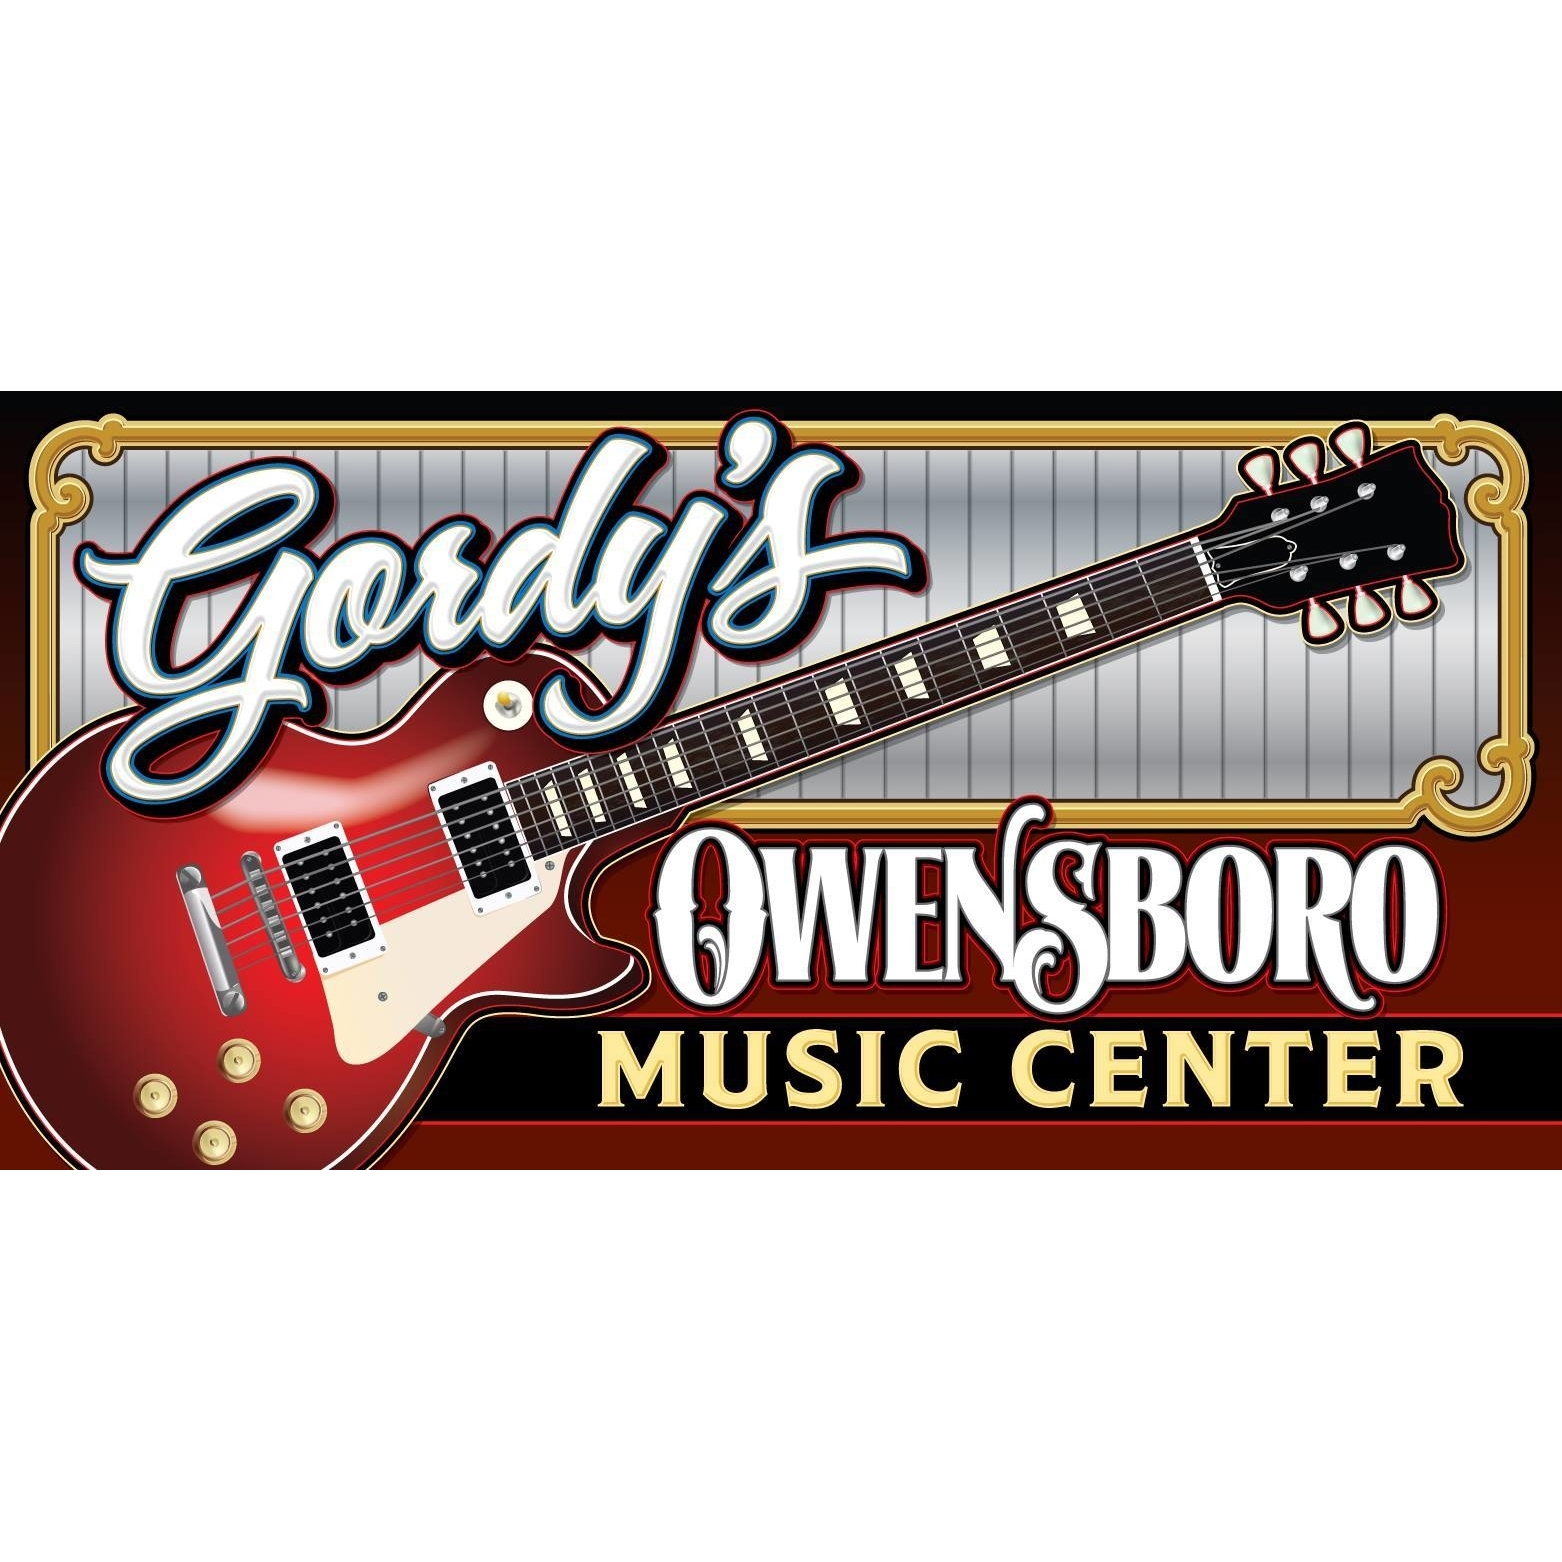 Ownesboro Music Center